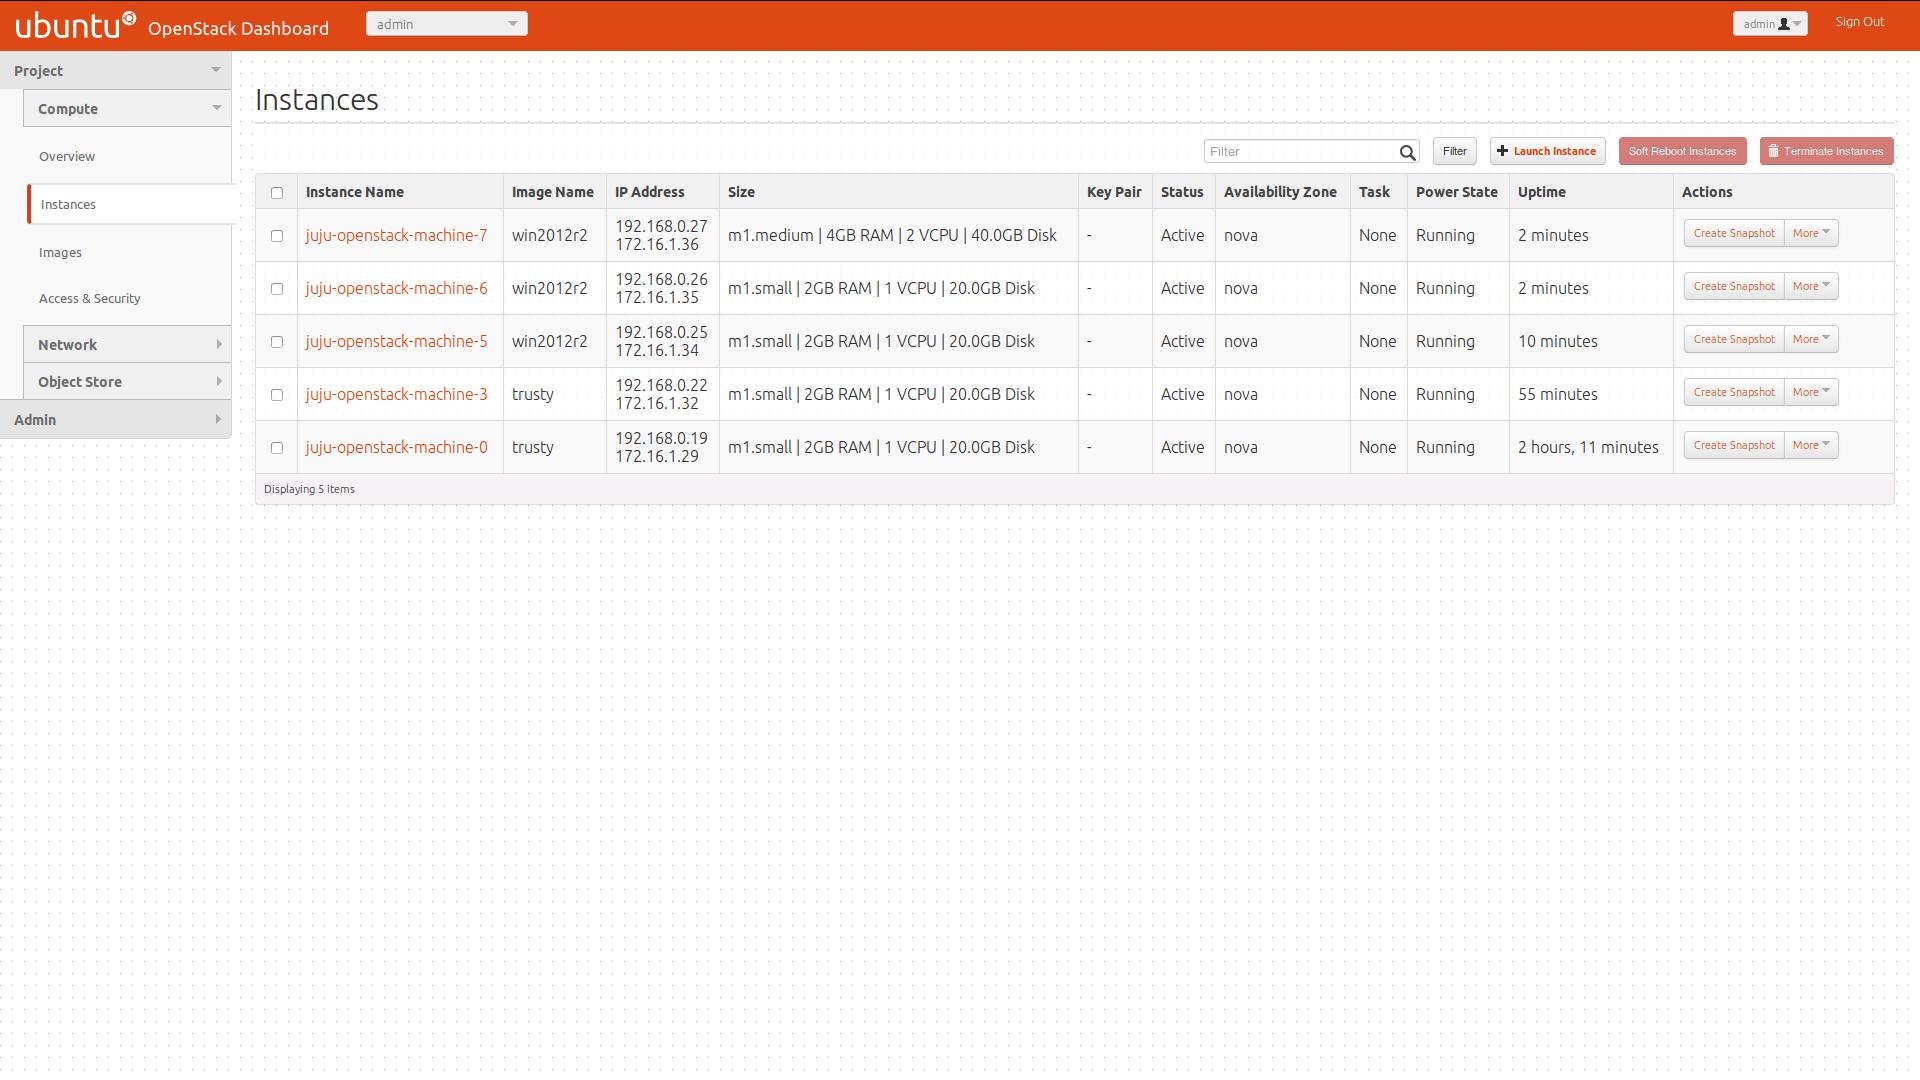 SharePoint Juju OpenStak instances